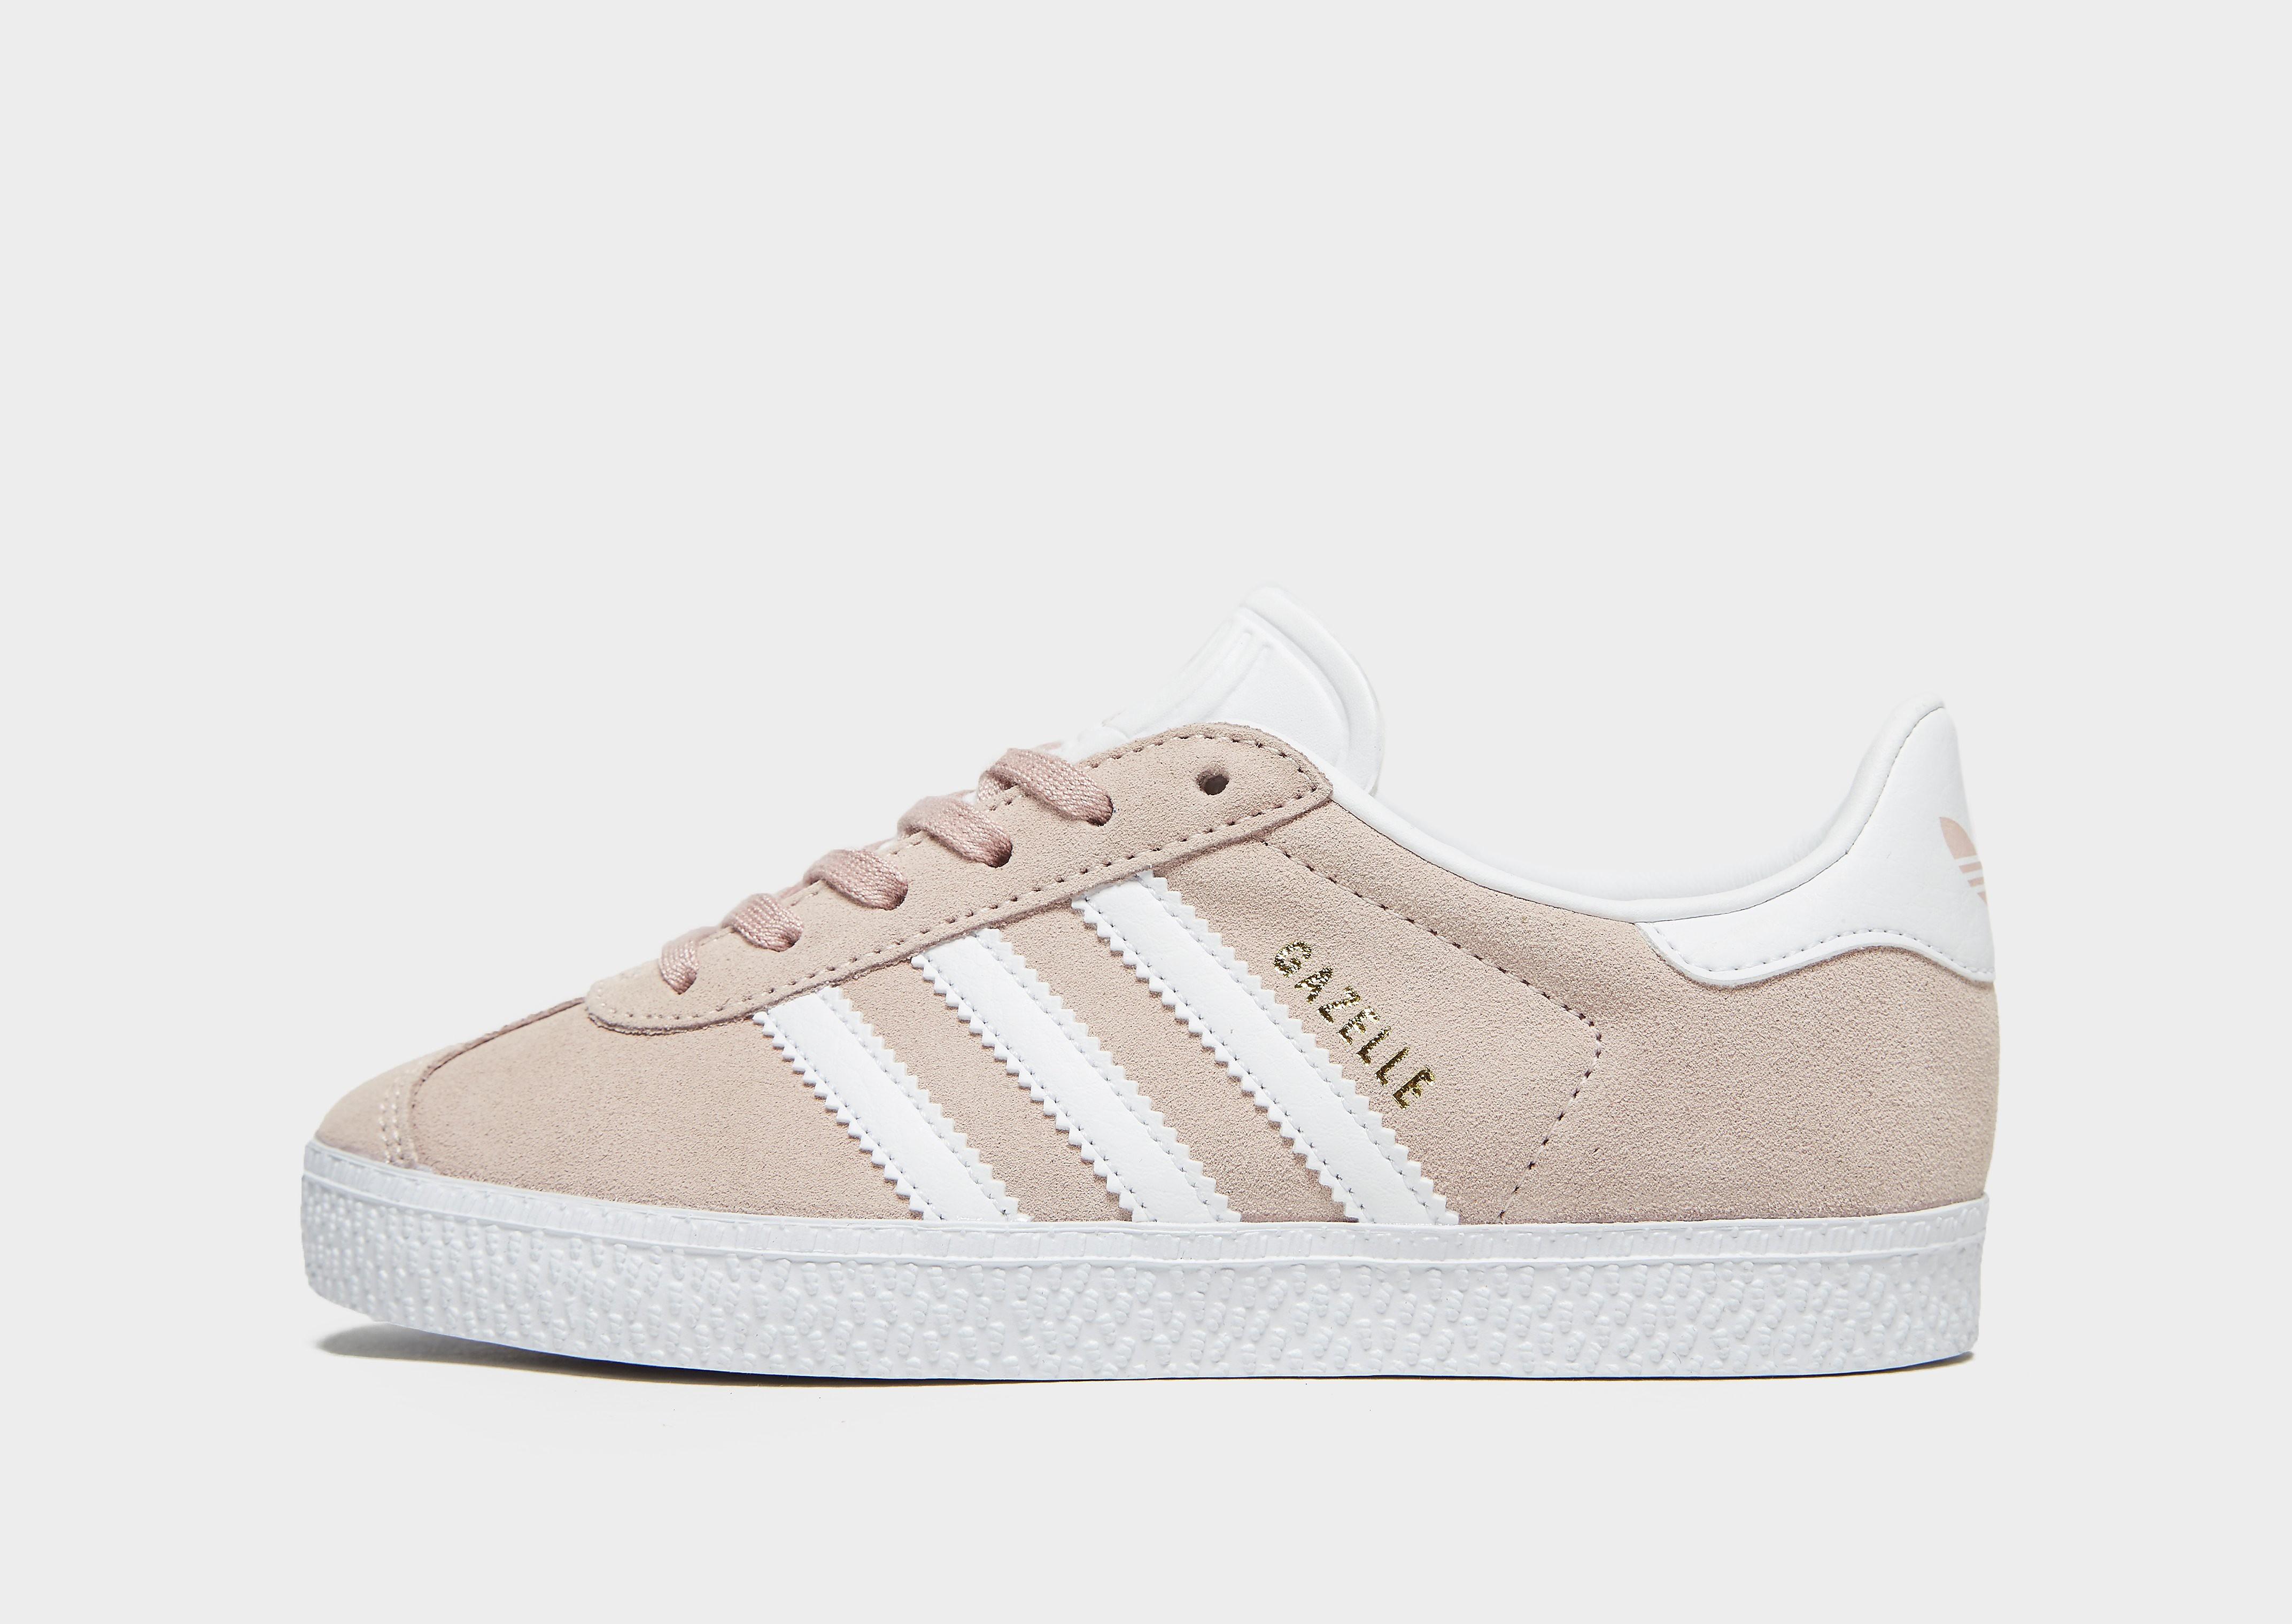 factory authentic e1388 4673a Sneaker Adidas adidas Originals Gazelle II infantil